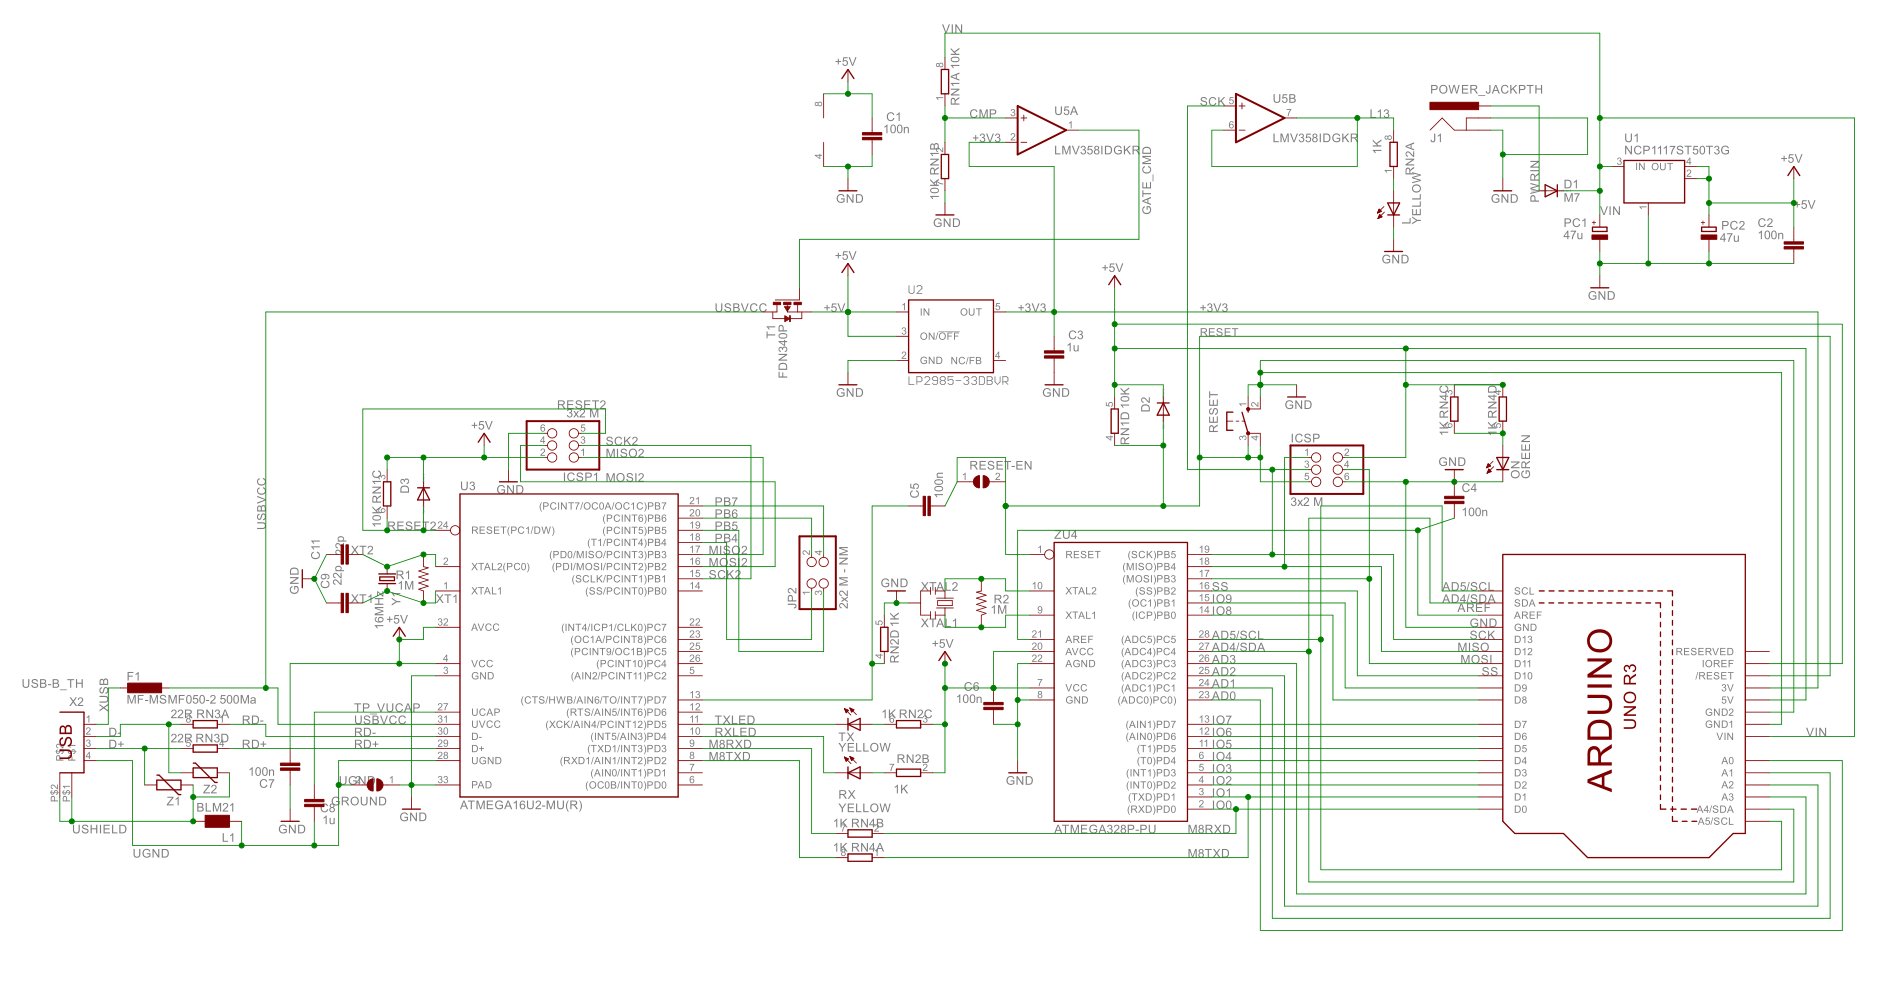 emg wiring diagram ibanez schematic of computer components hsh strat elsalvadorla